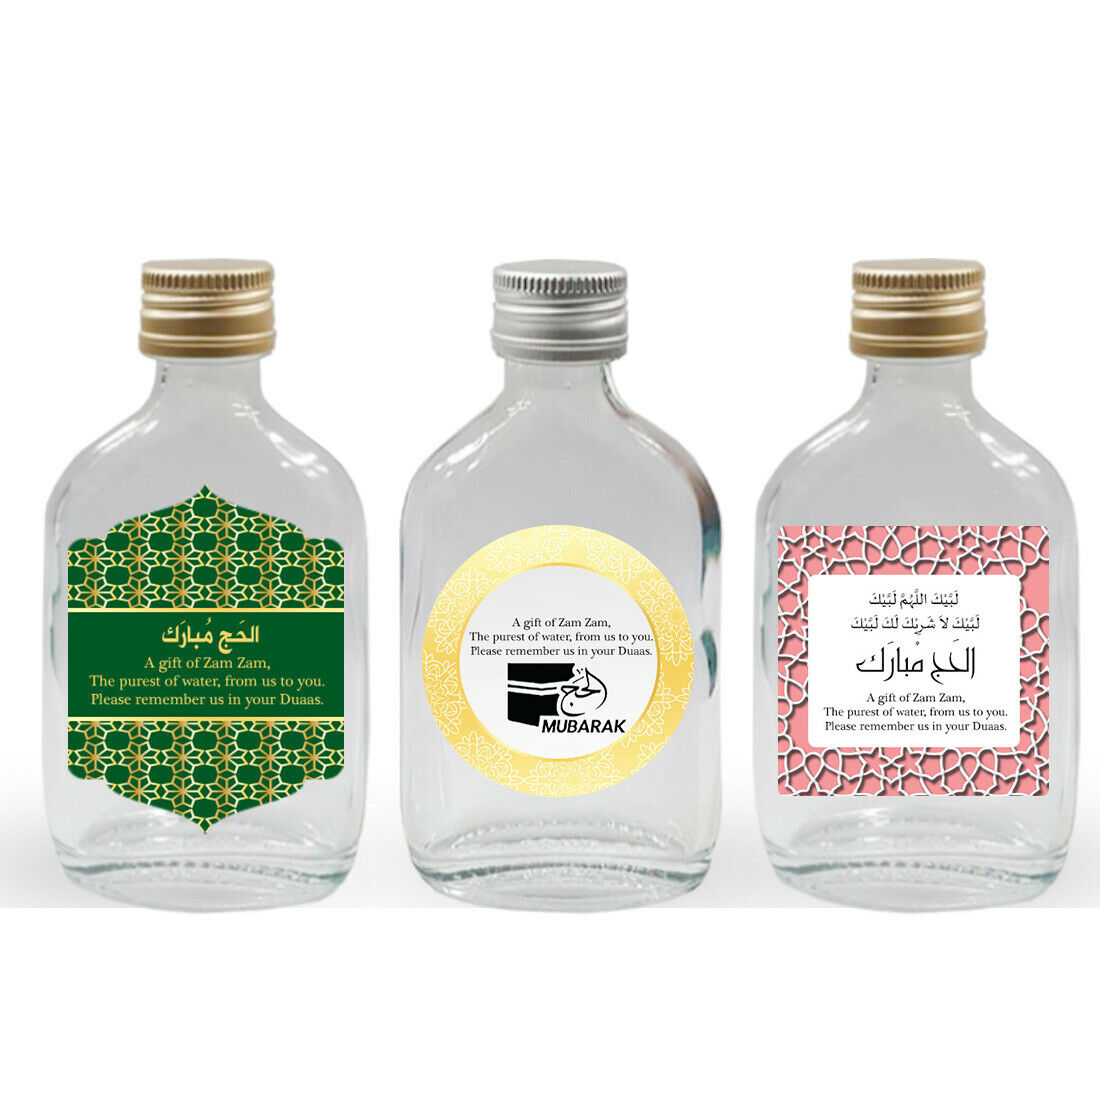 Zam zam Bottles Islamic Wedding Party Favors Umrah Hajj Bottles 1 To A 100 S7